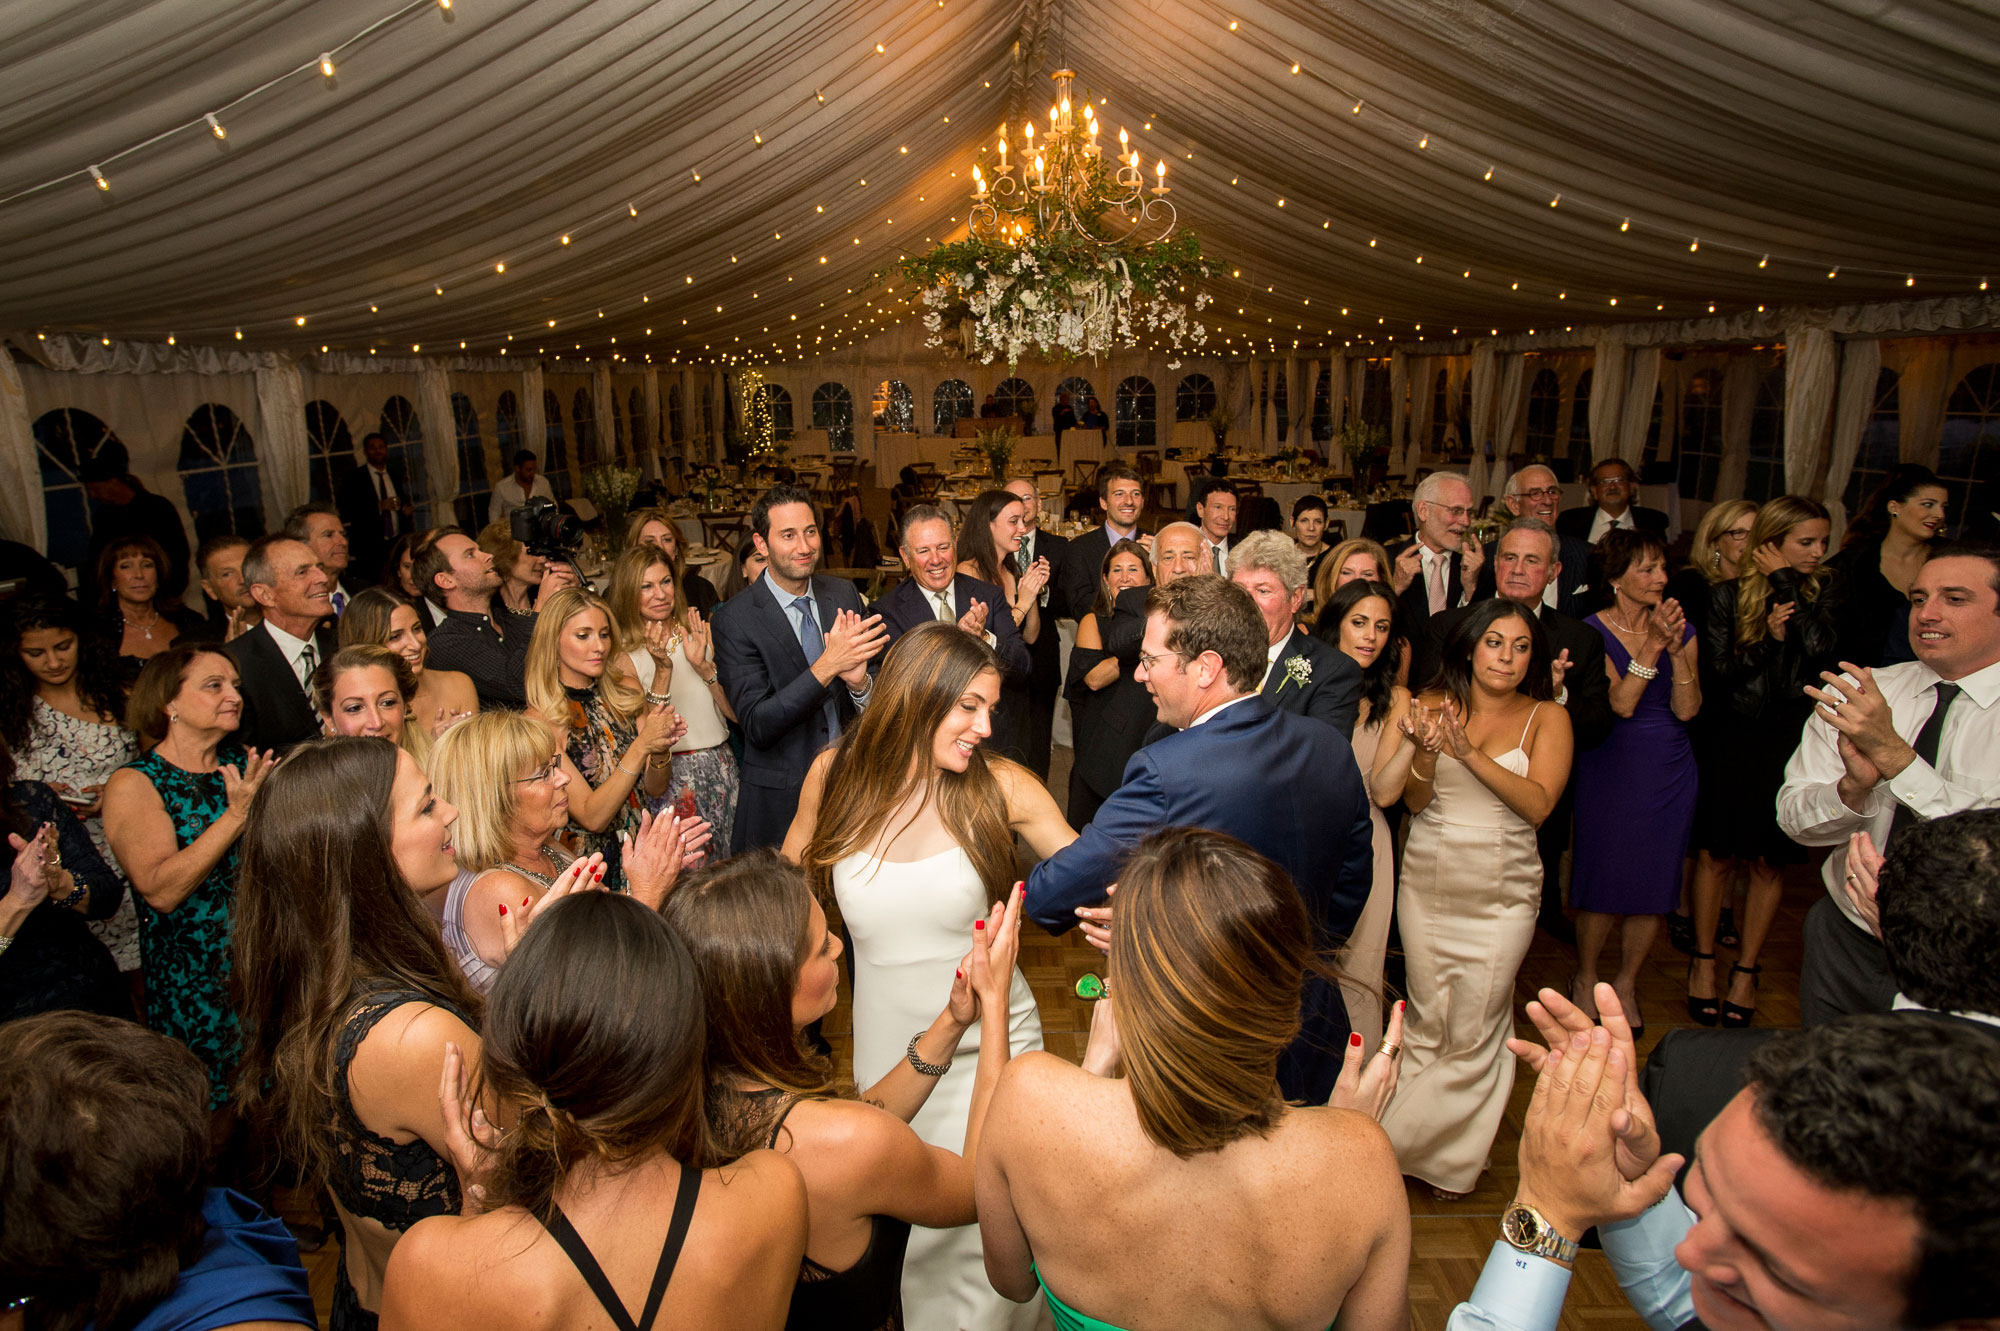 SunValleyWedding0120A Chic Mountain Wedding in Sun Valley, Idaho